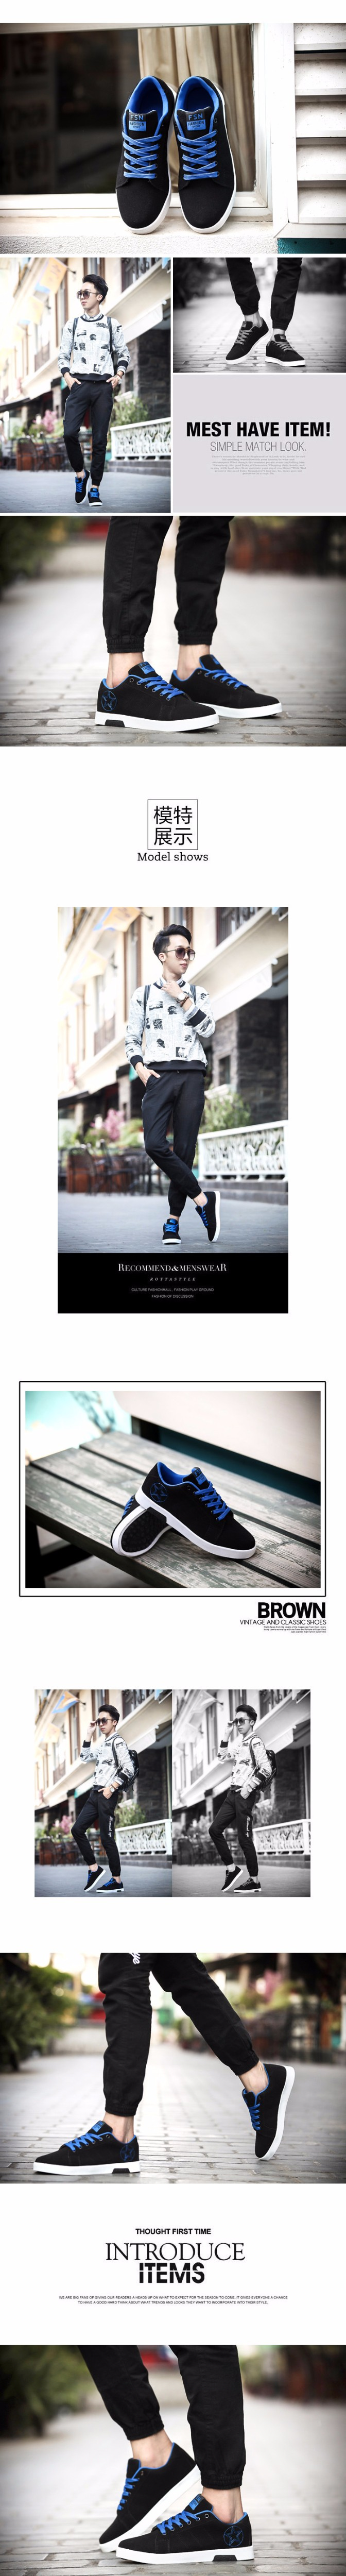 Geguistle 2018 Spring Autumn Fashion Shoes Men's Casual Shoes Breathable New Men Canvas Shoes Gay Male Lace up Shoes6